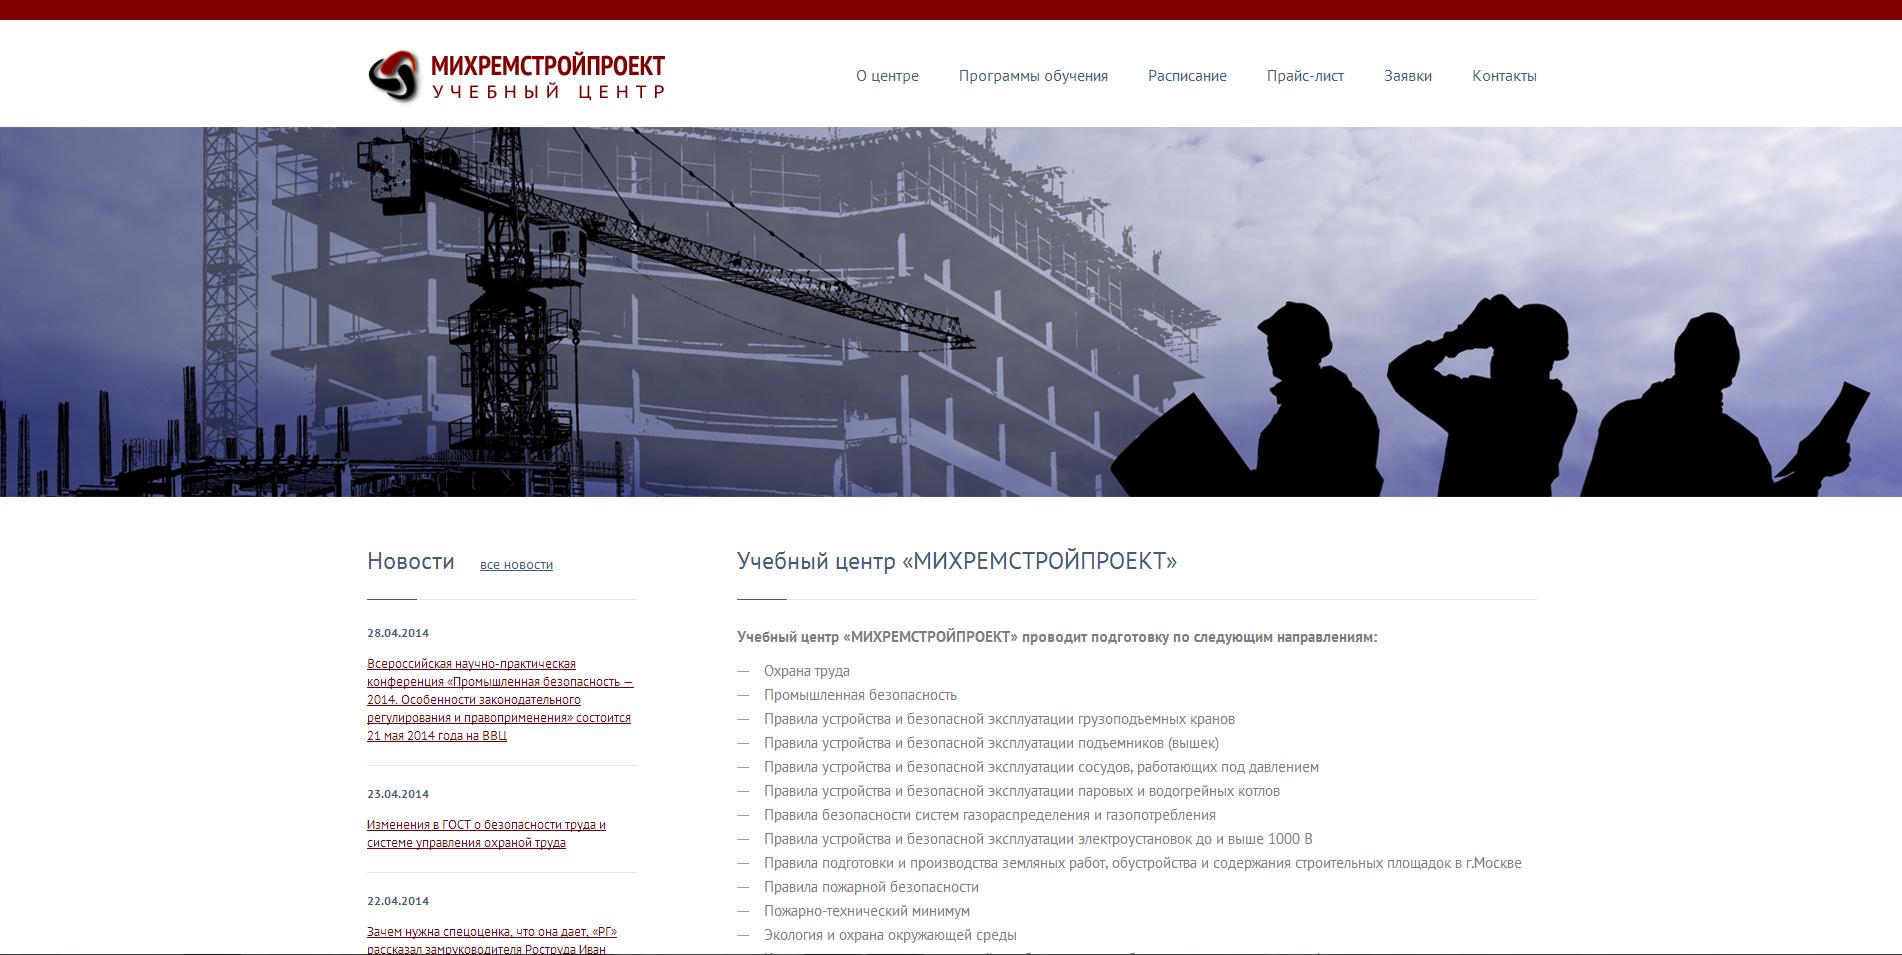 Учебный центр «МИХРЕМСТРОЙПРОЕКТ»